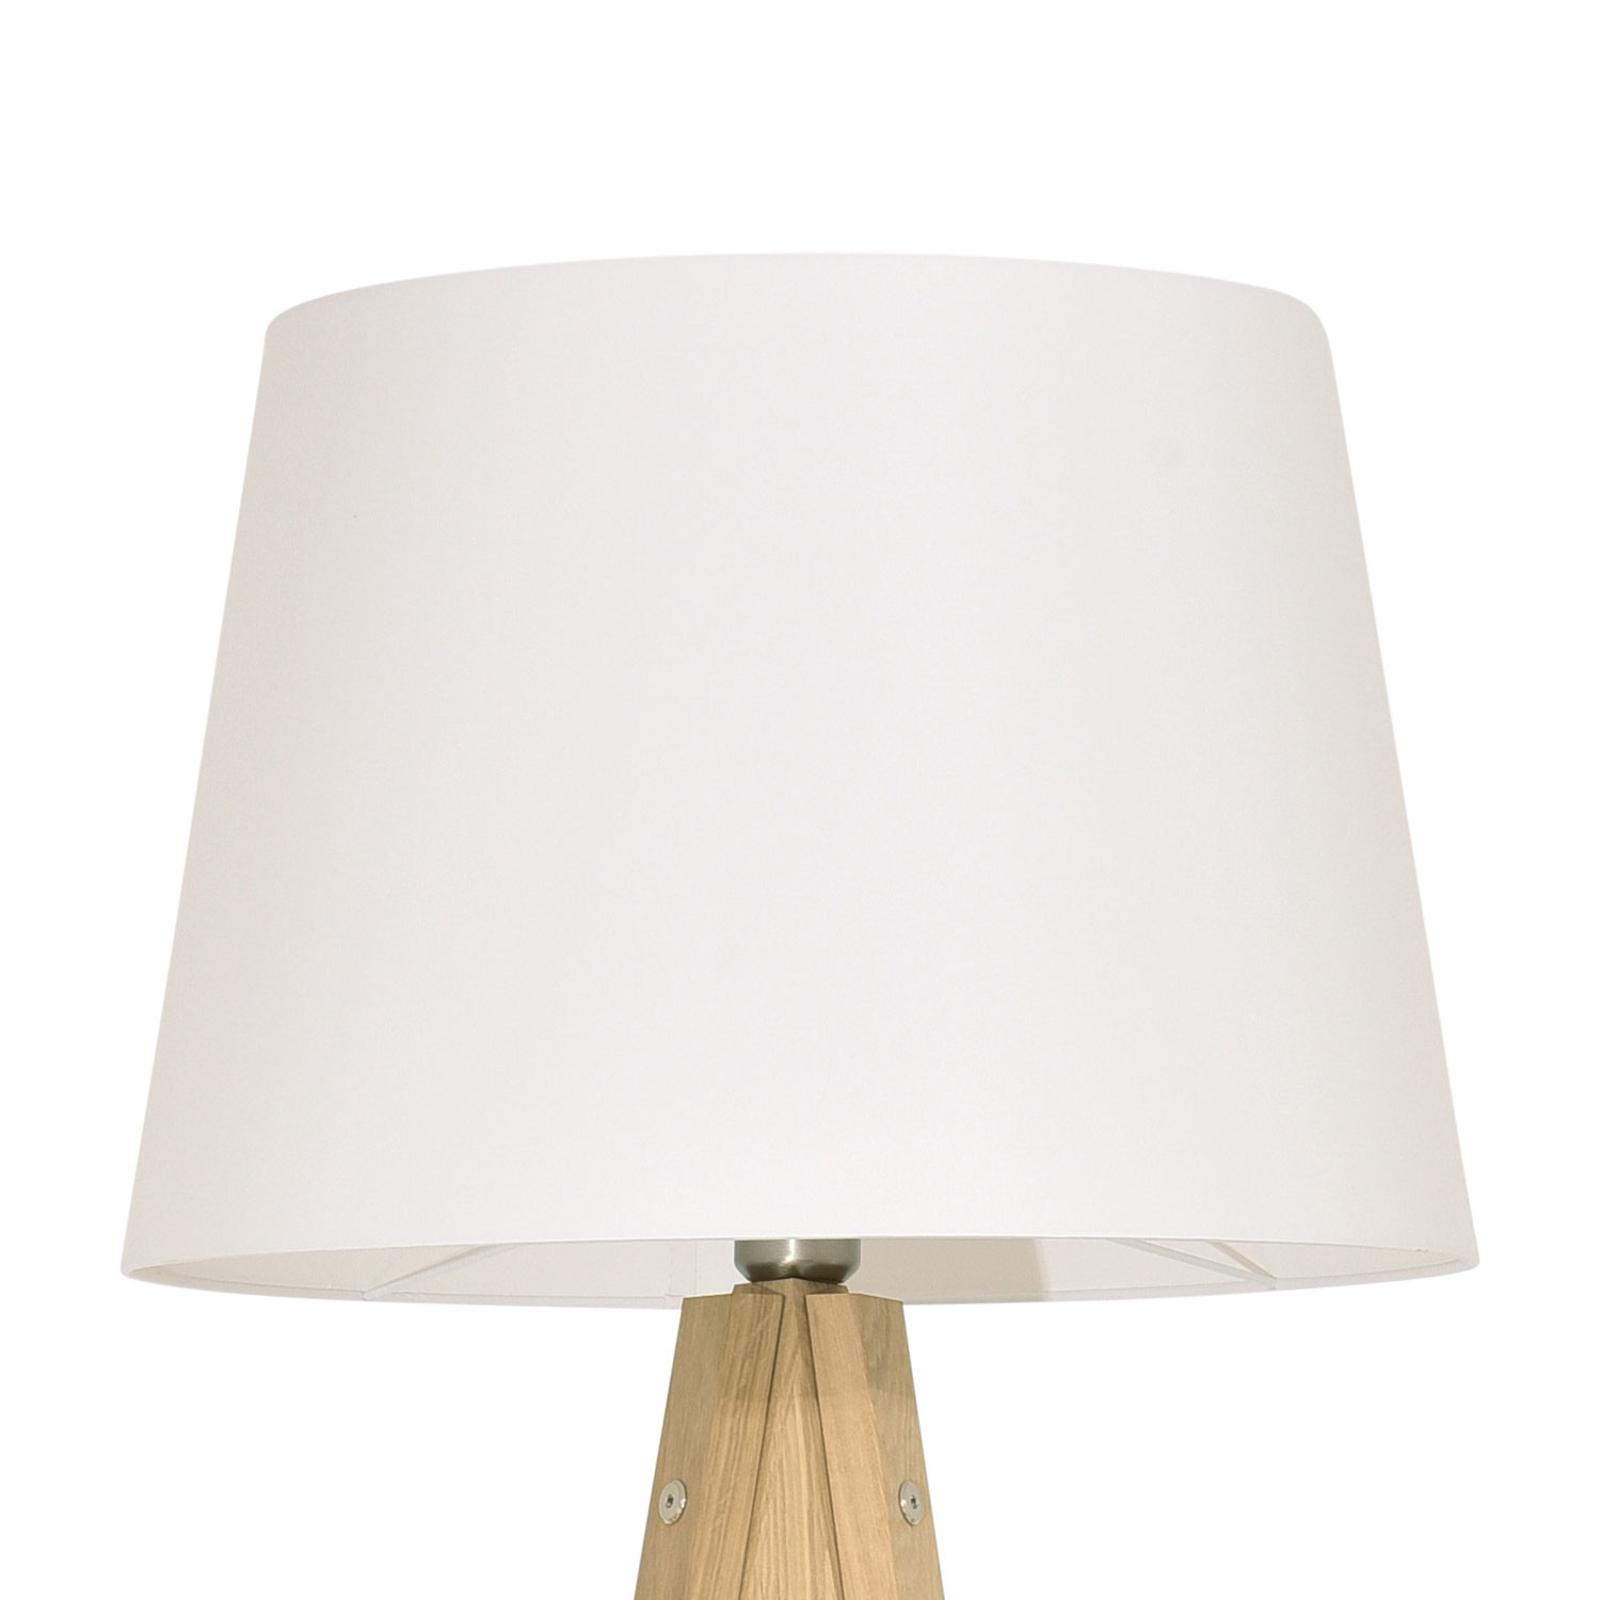 Erlkönig Prinz lampad. chêne nat., abat-jour blanc